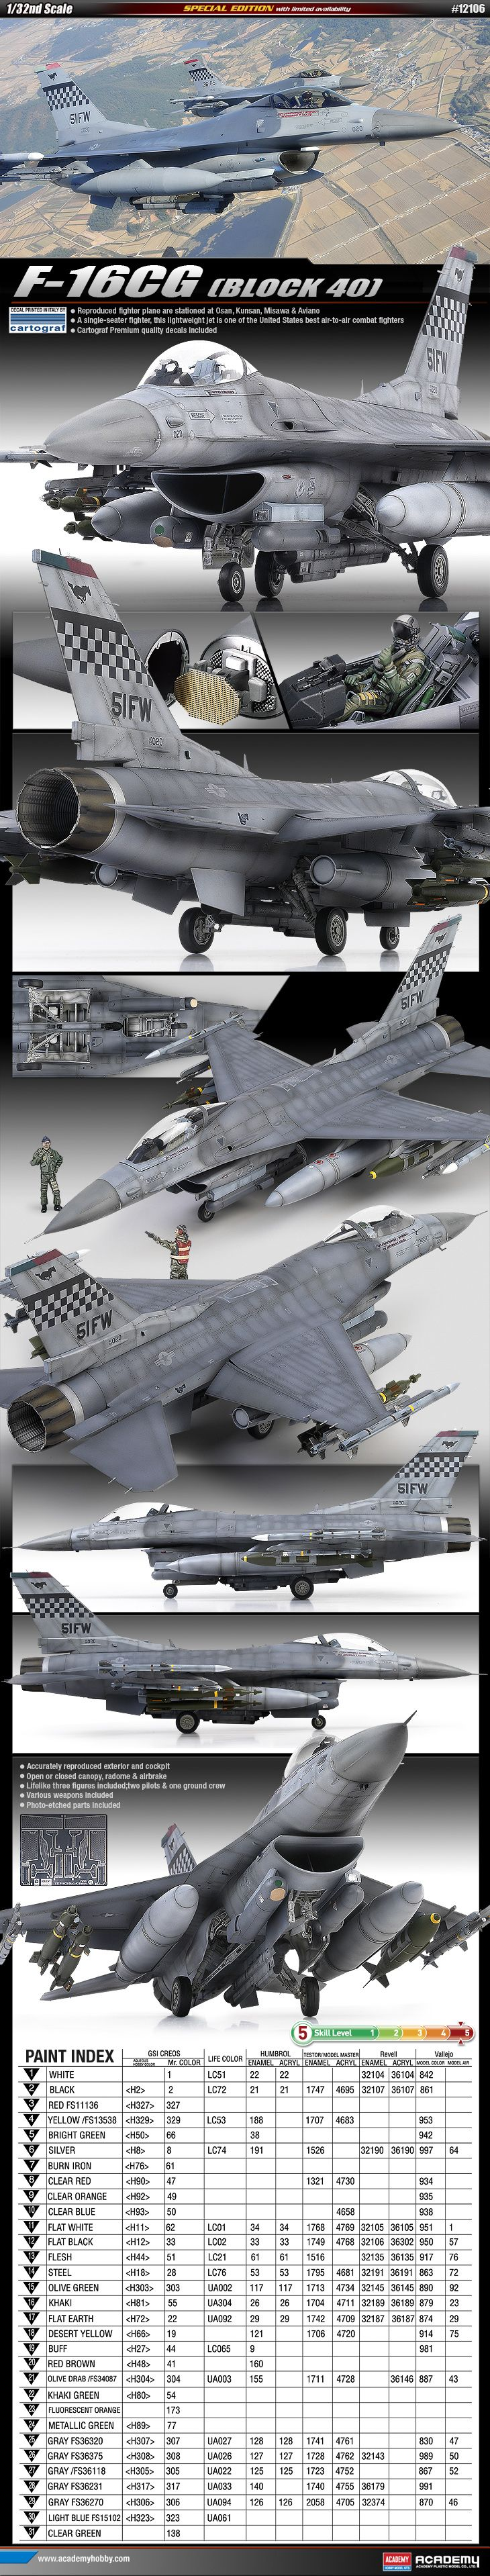 F-16CG BLOCK 40 Academy Model Scale 1:32